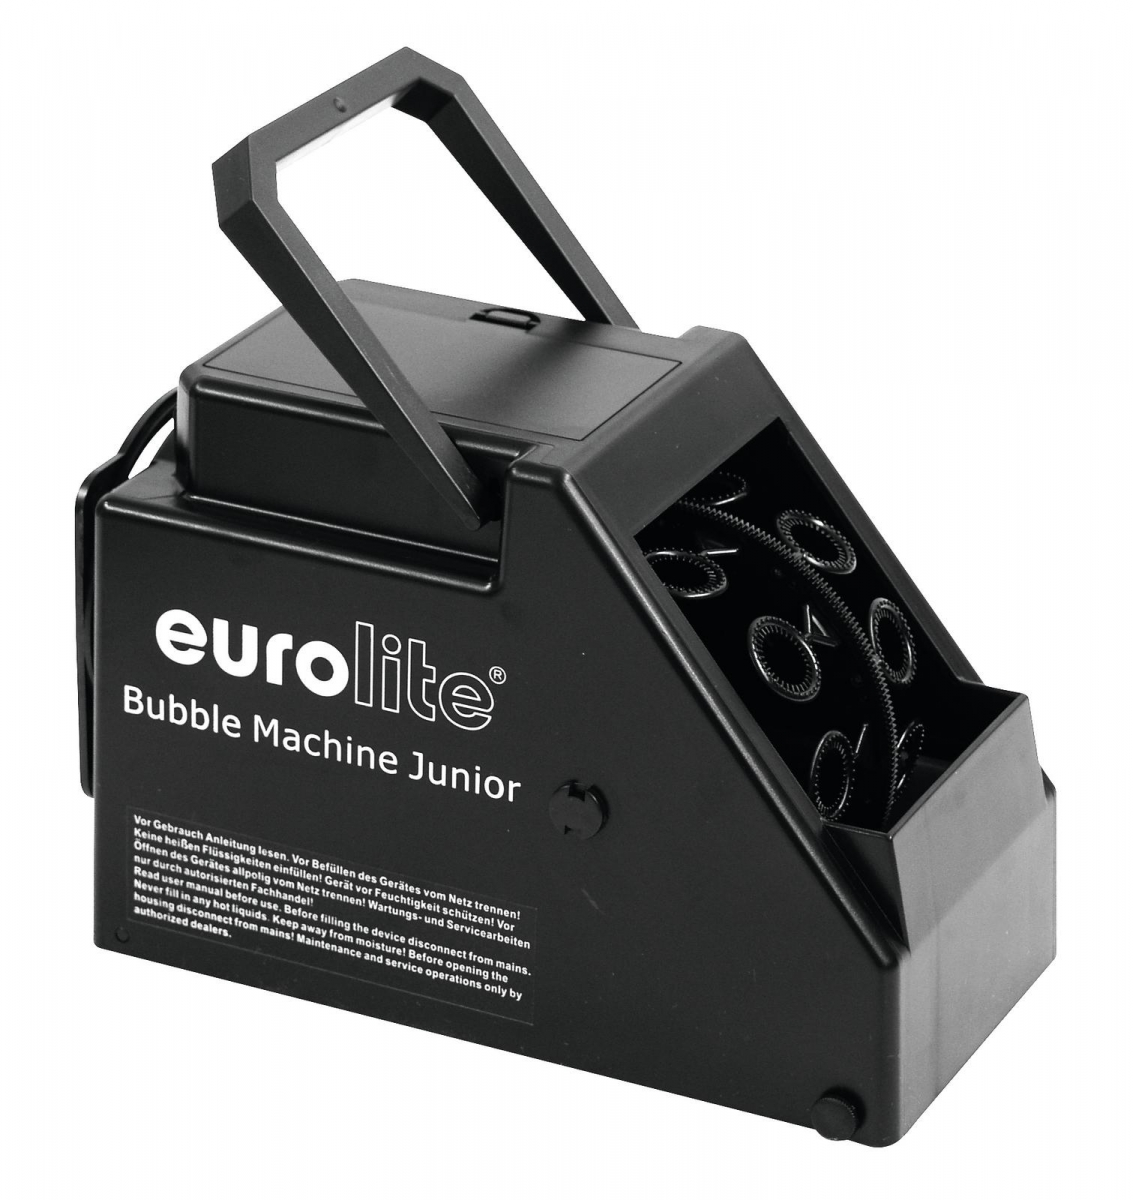 EUROLITEB-60 Seifenblasenmaschine Junior